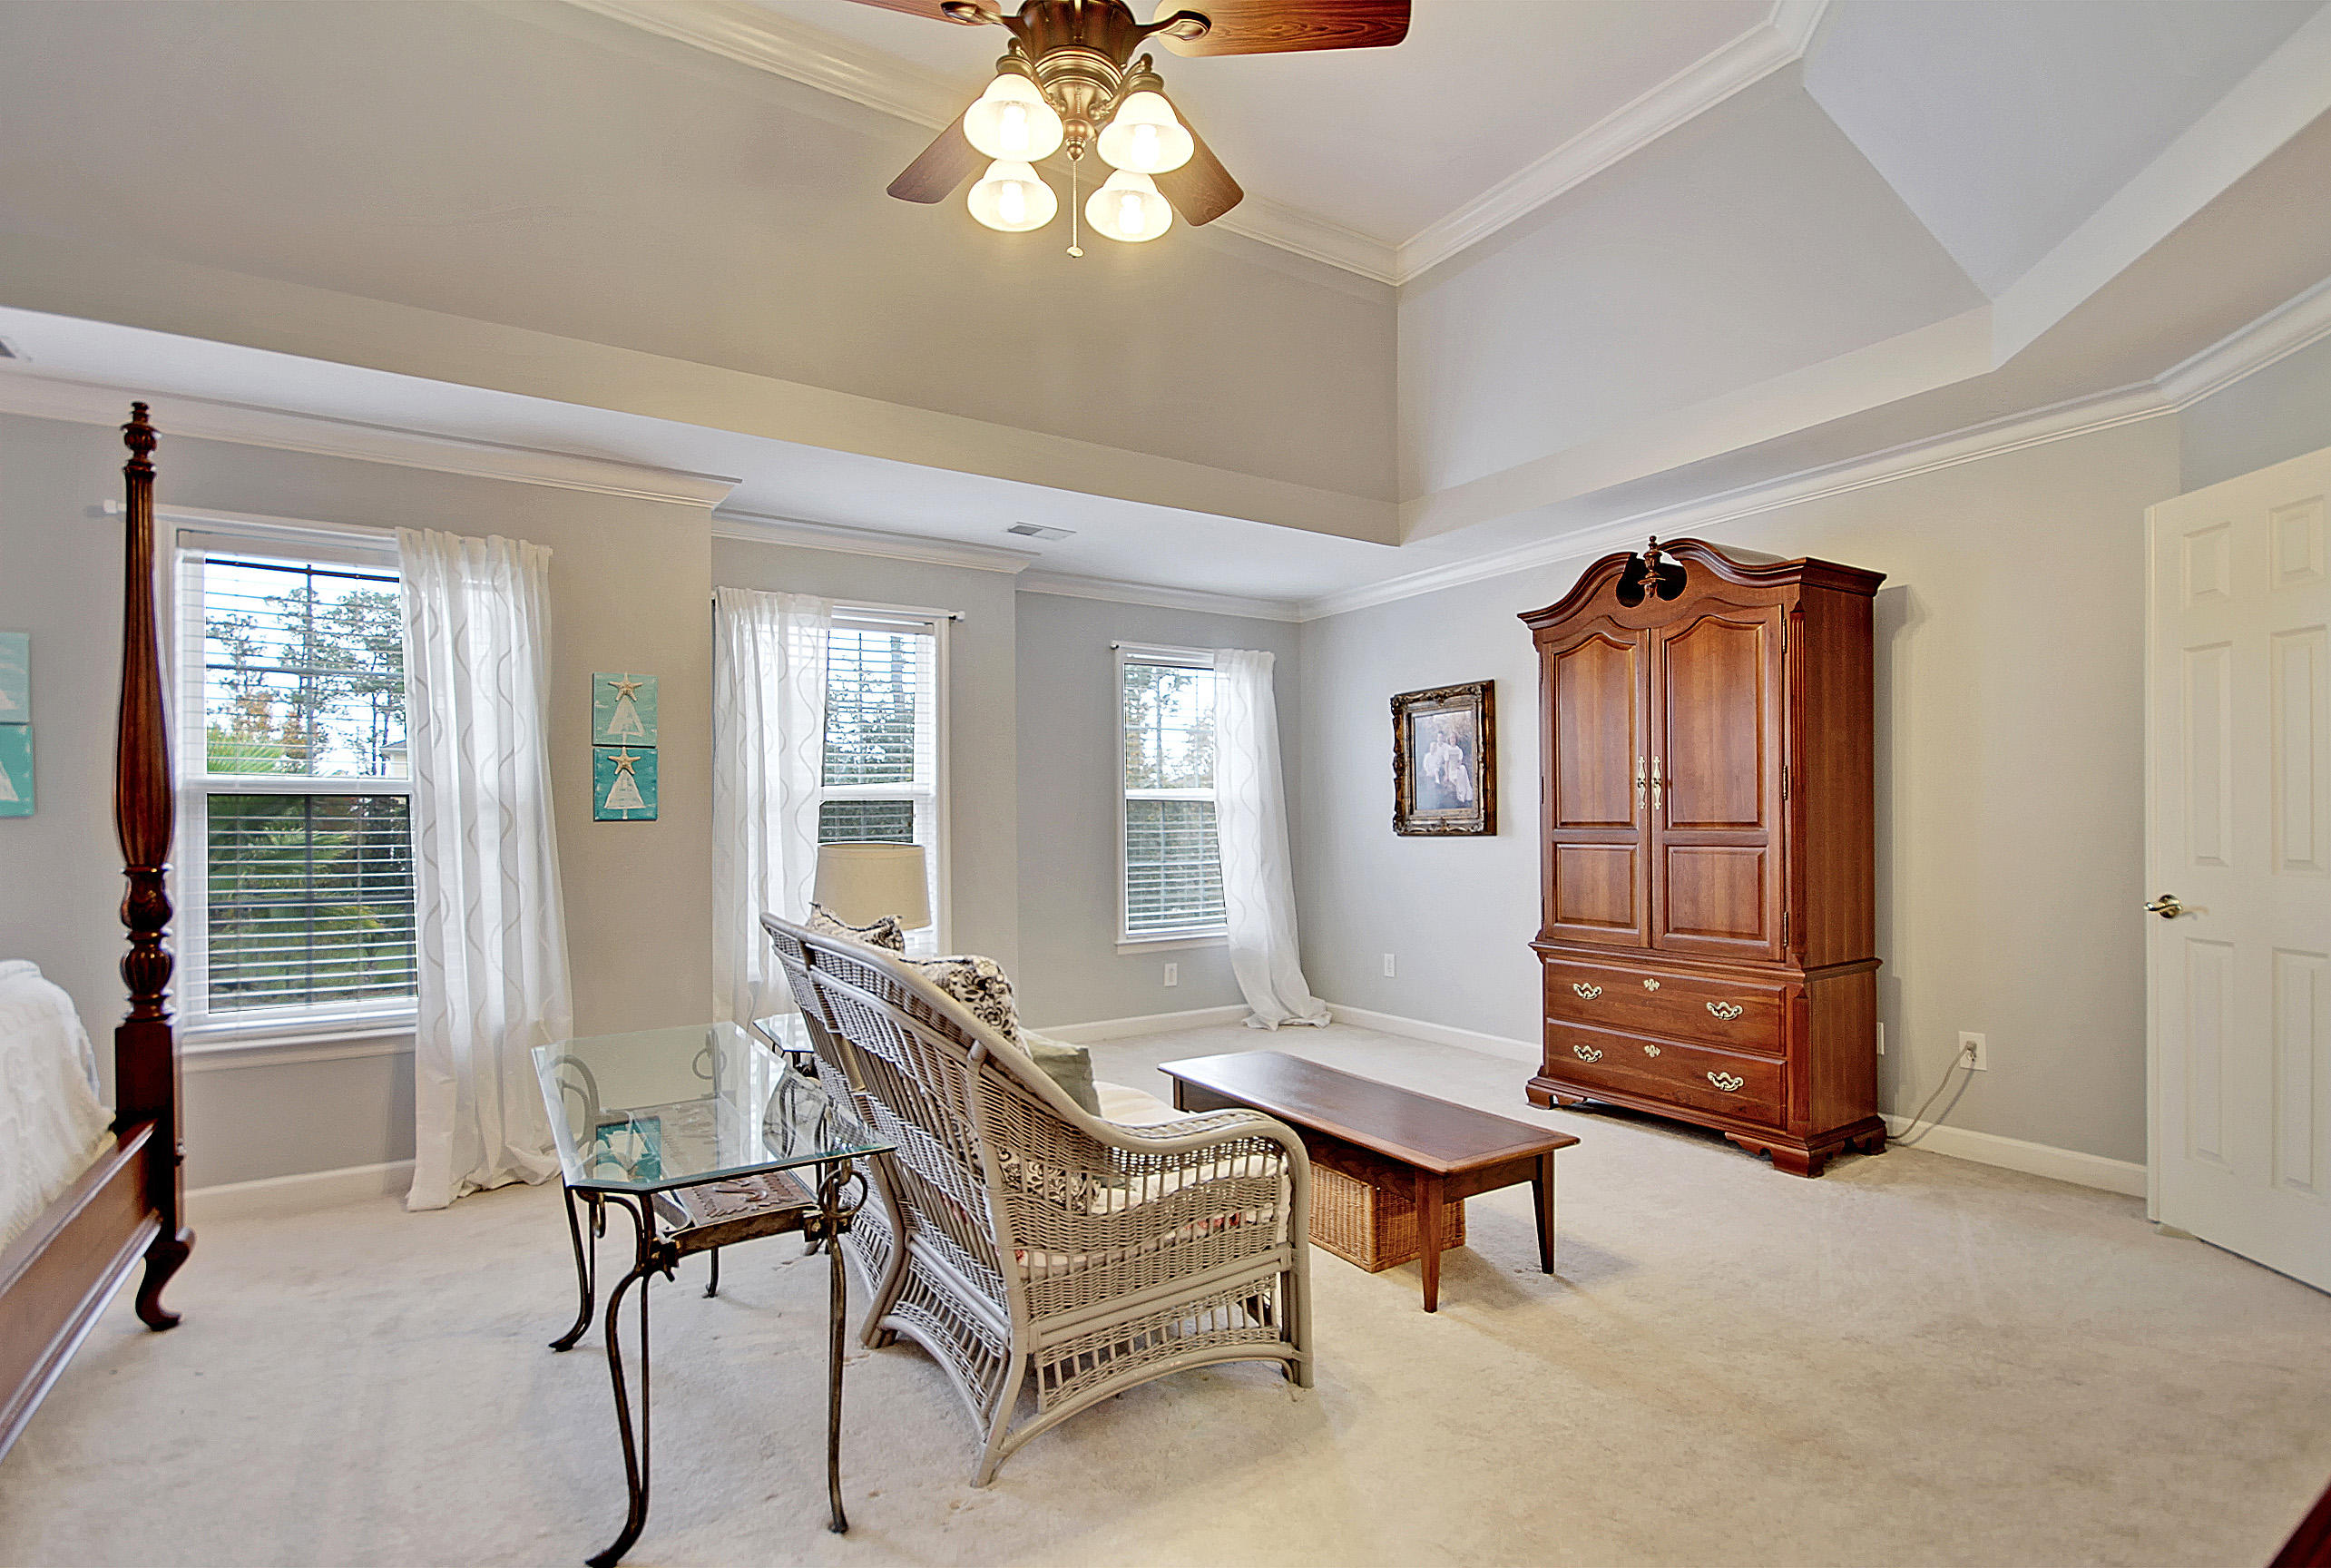 Dunes West Homes For Sale - 2449 Darts Cove, Mount Pleasant, SC - 38